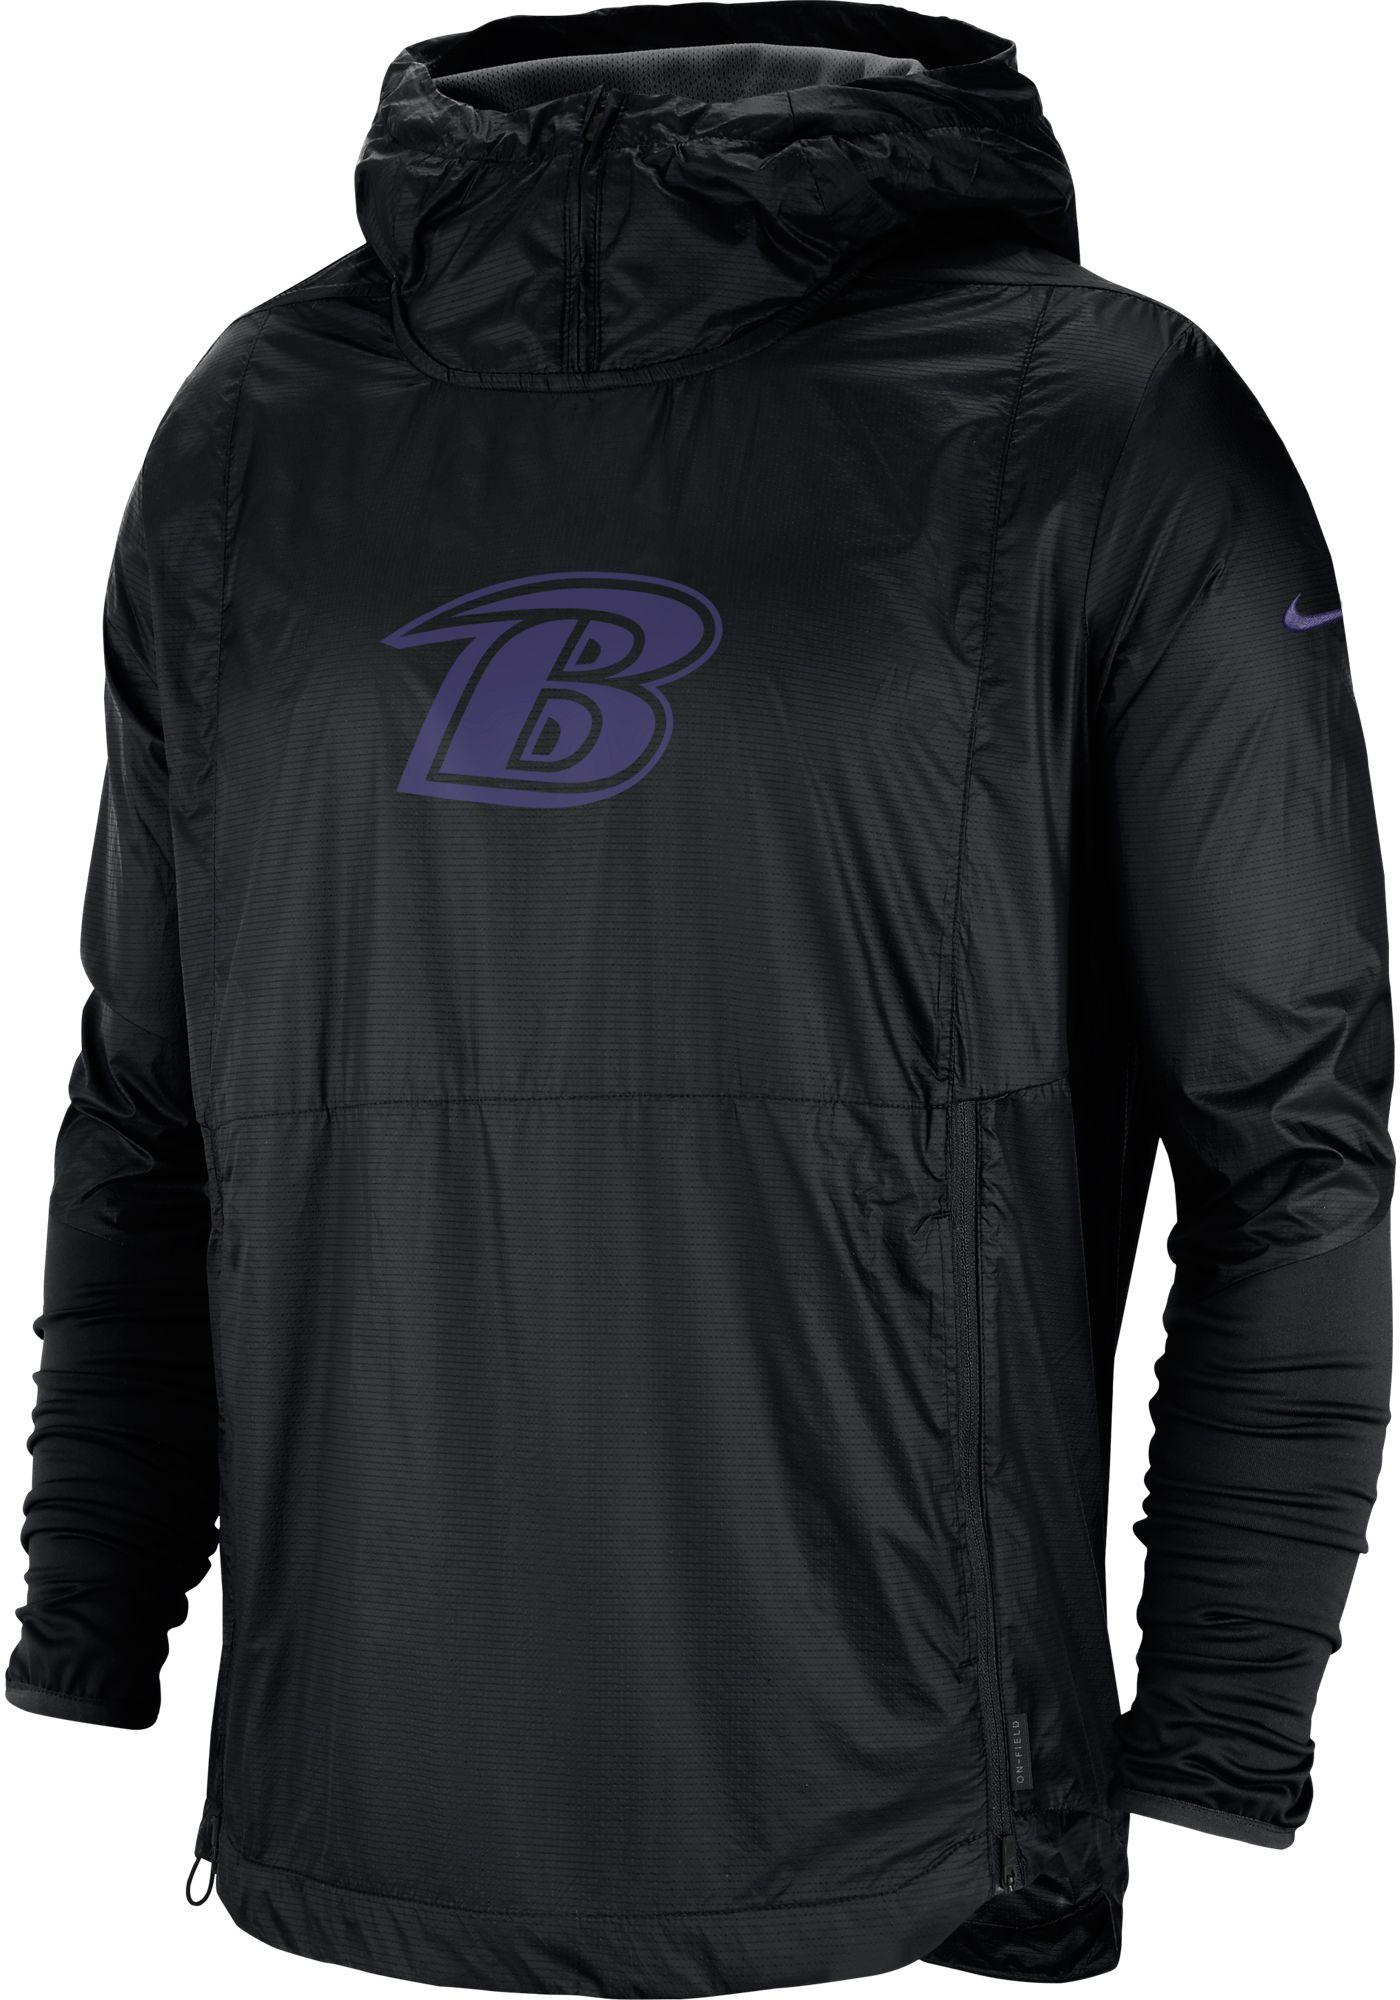 Nike Men's Baltimore Ravens Sideline Repel Player Black Jacket